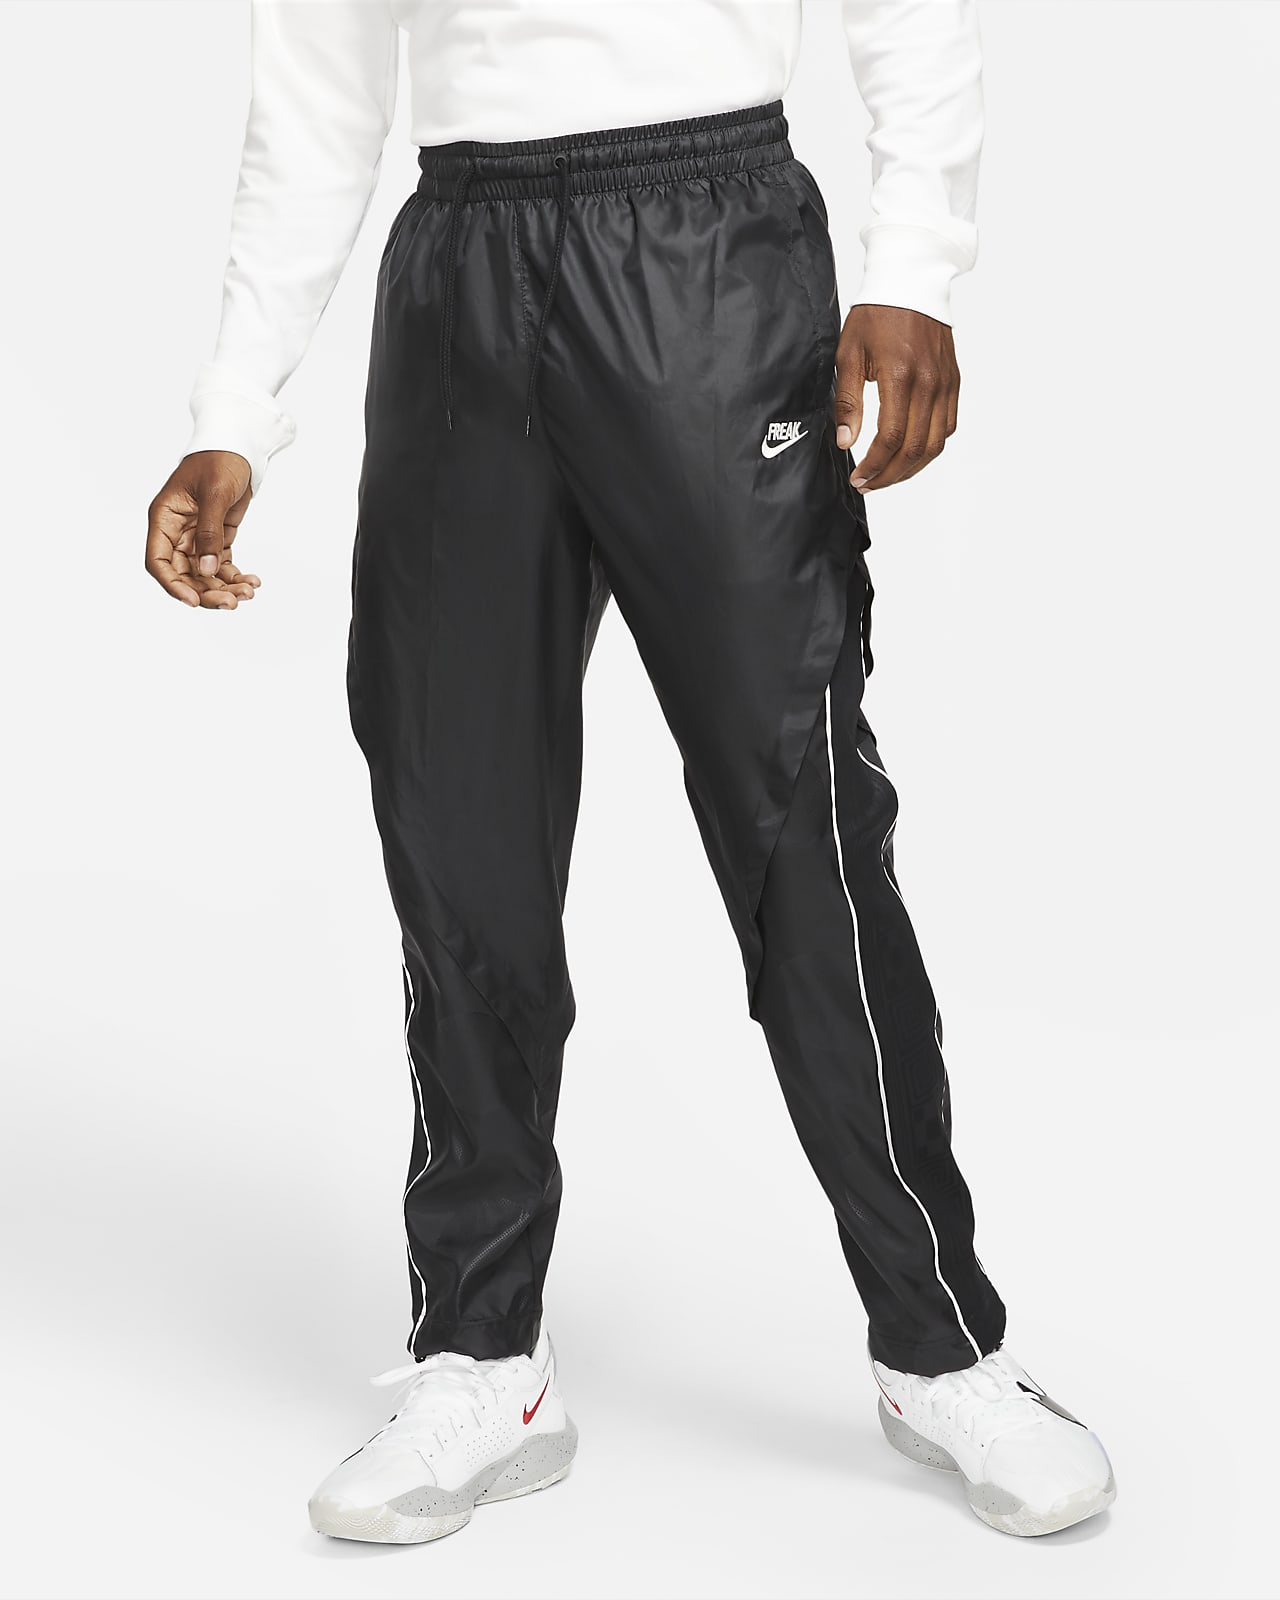 Pants de entrenamiento ligeros para hombre Giannis